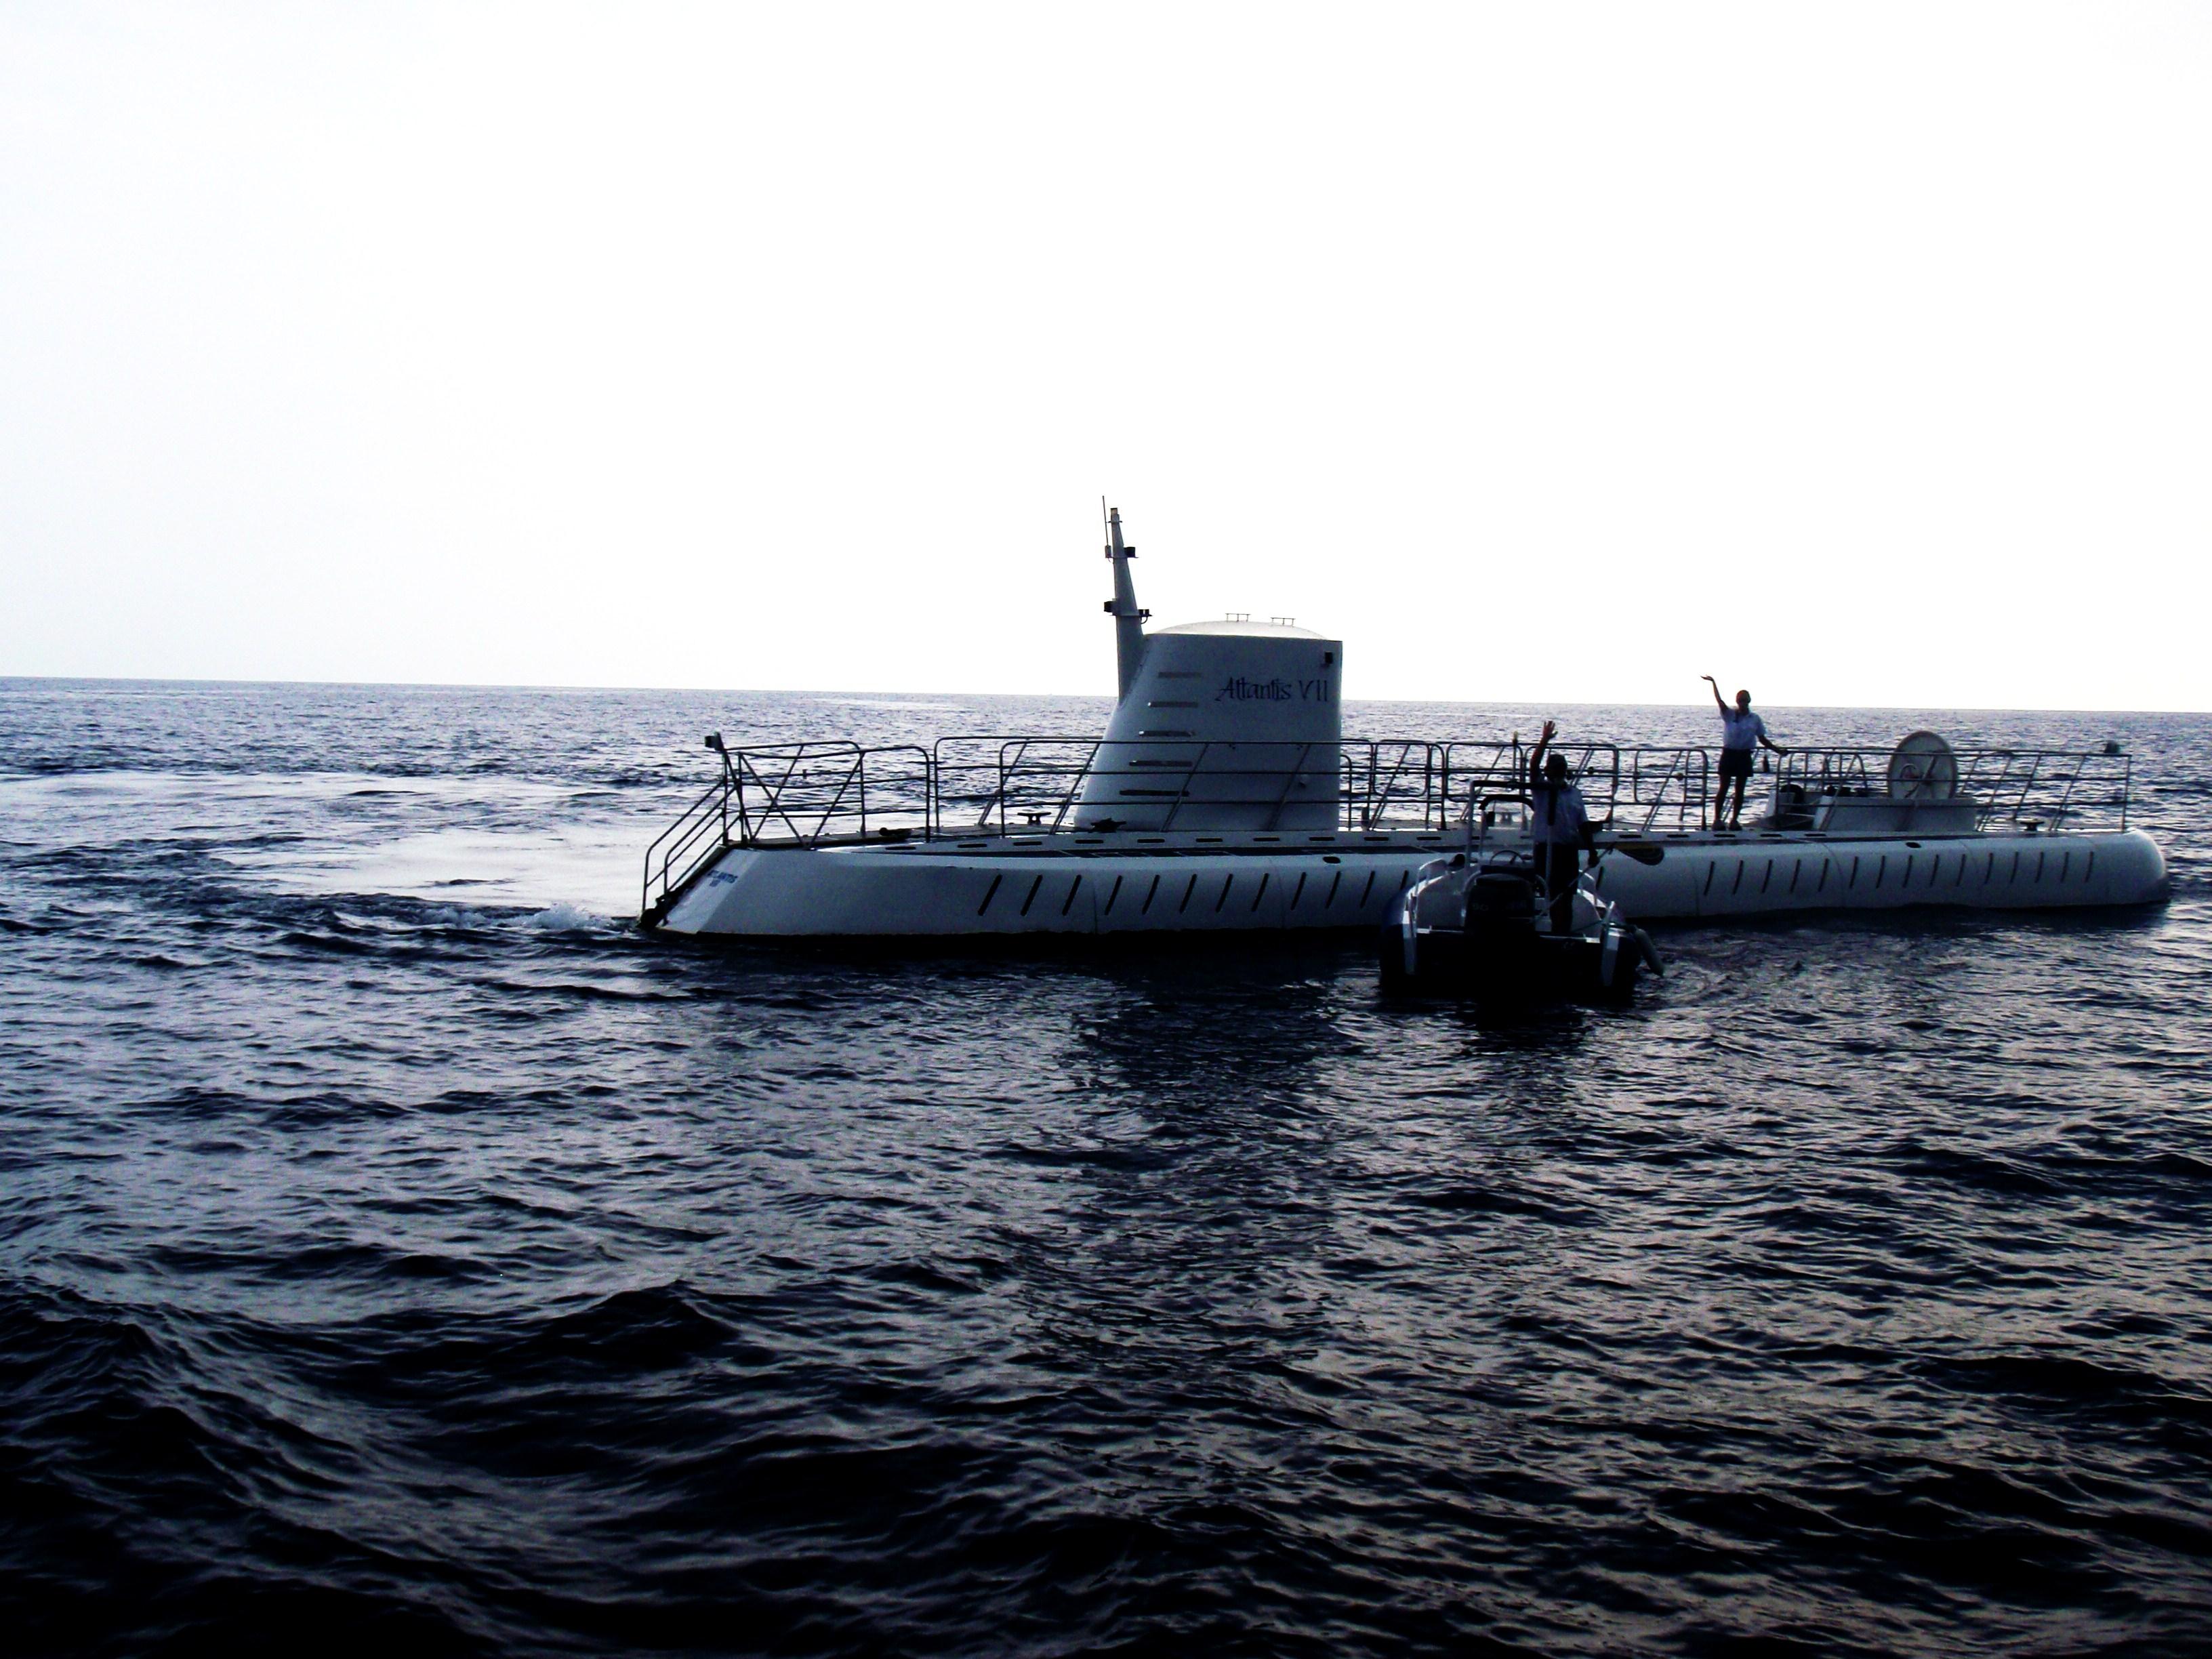 submarine ride in hawaii